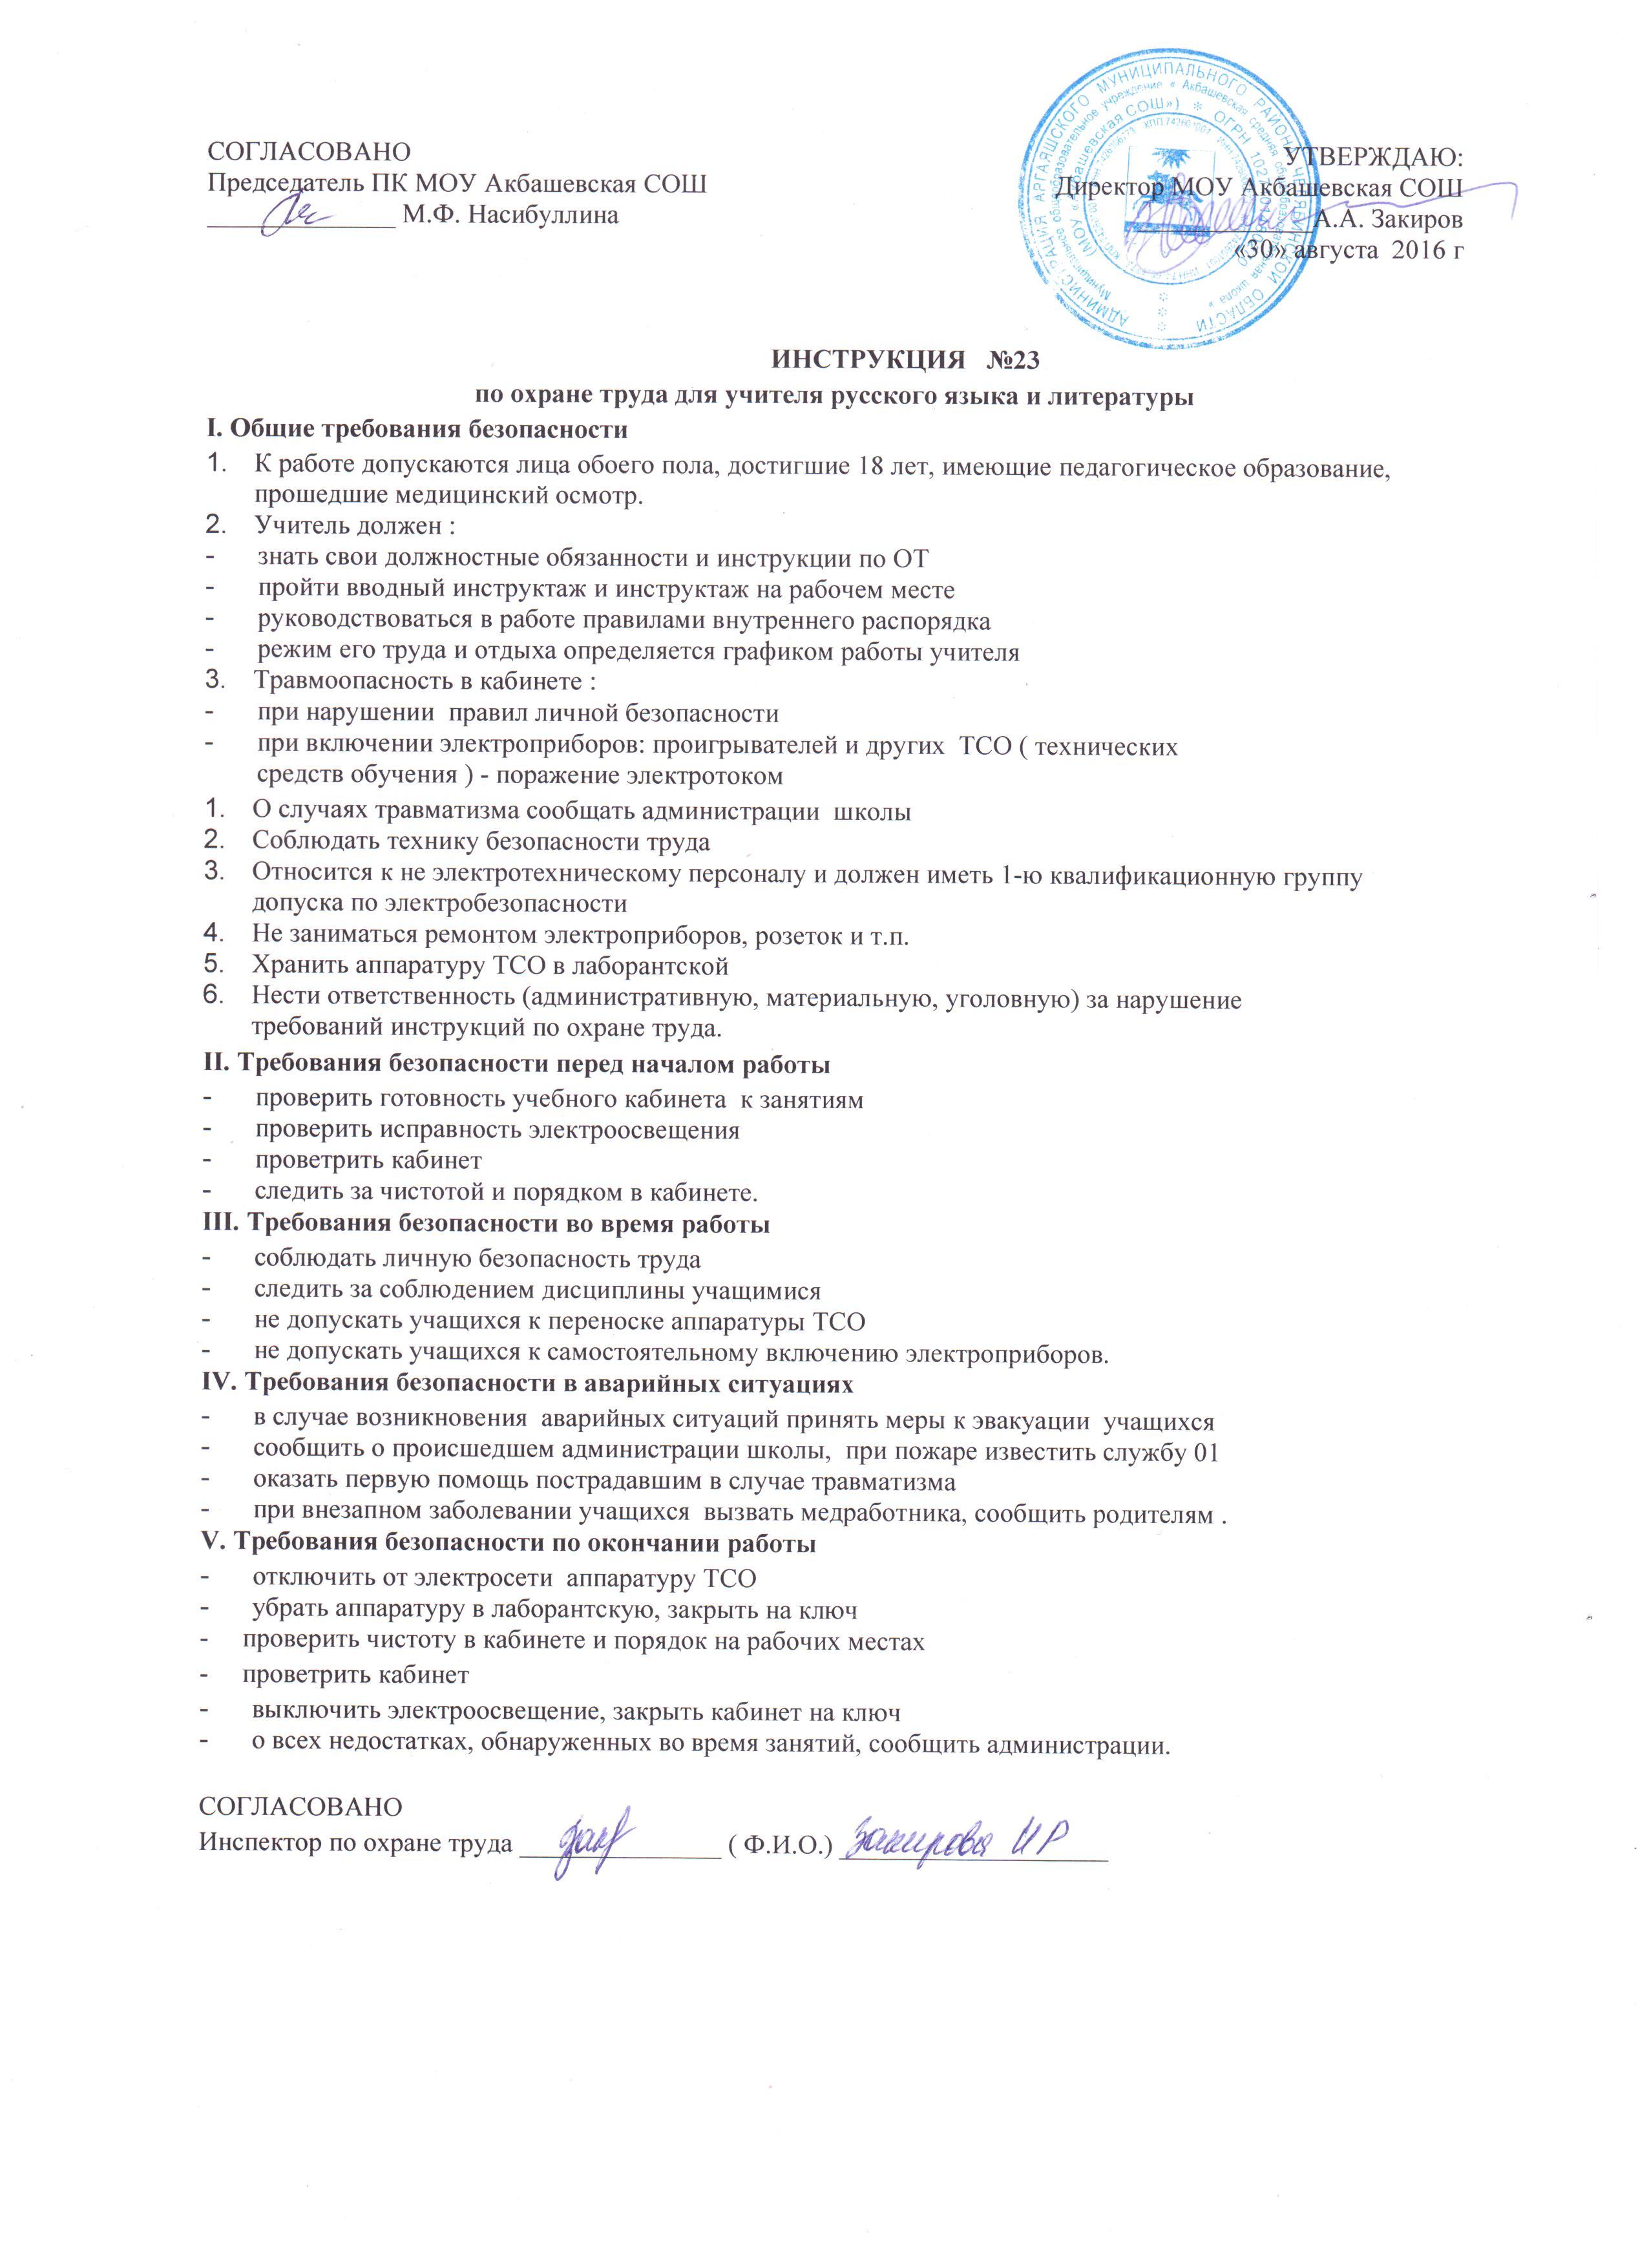 Инструкция по охране труда оператора-ко